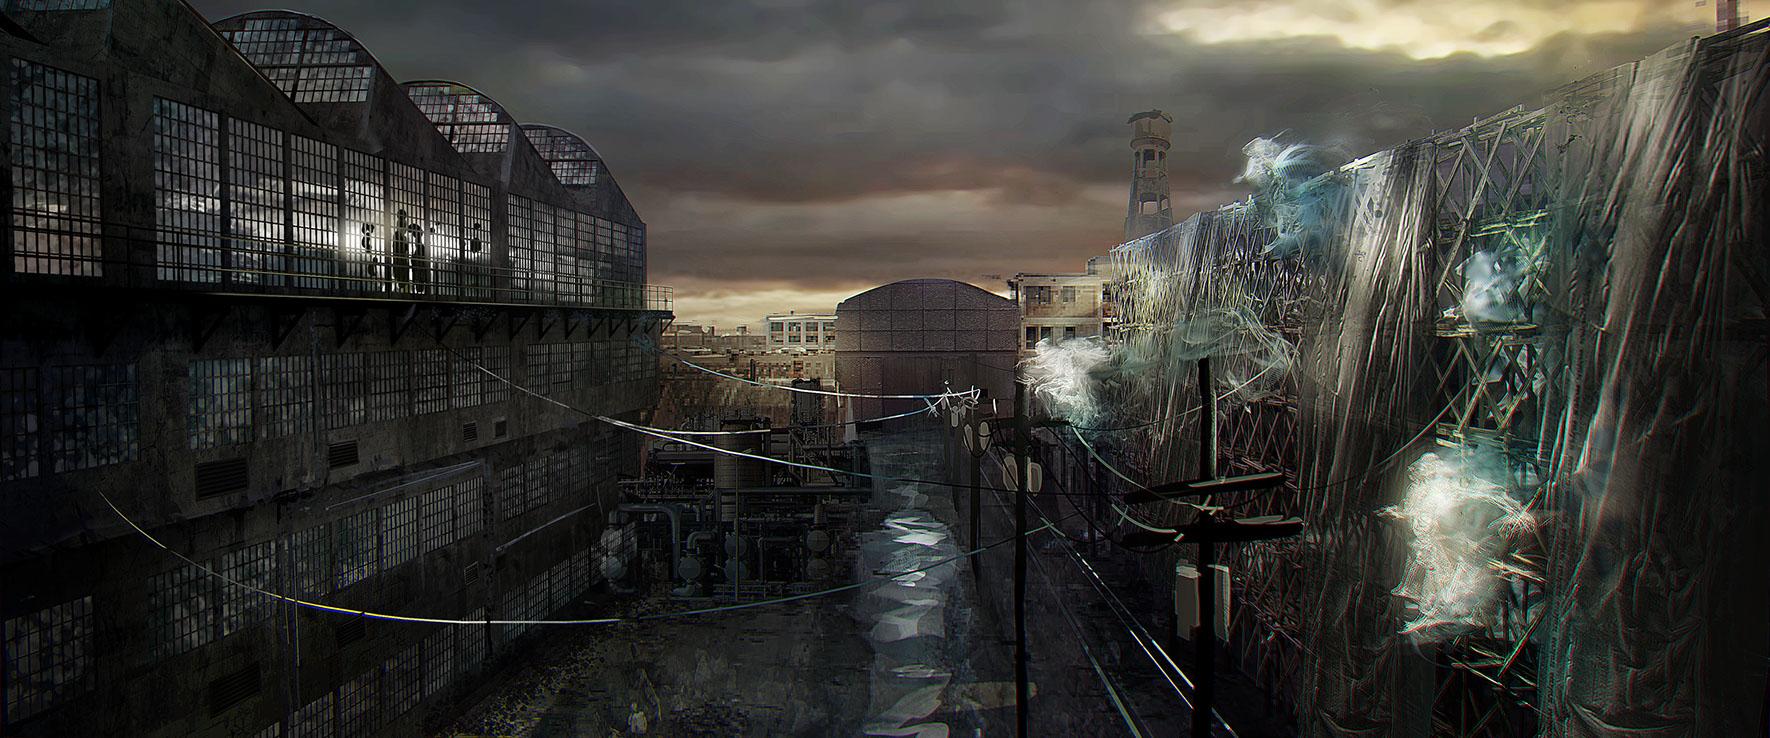 netflix-spectral-movie-concept-art-factory_area_compromised_v10